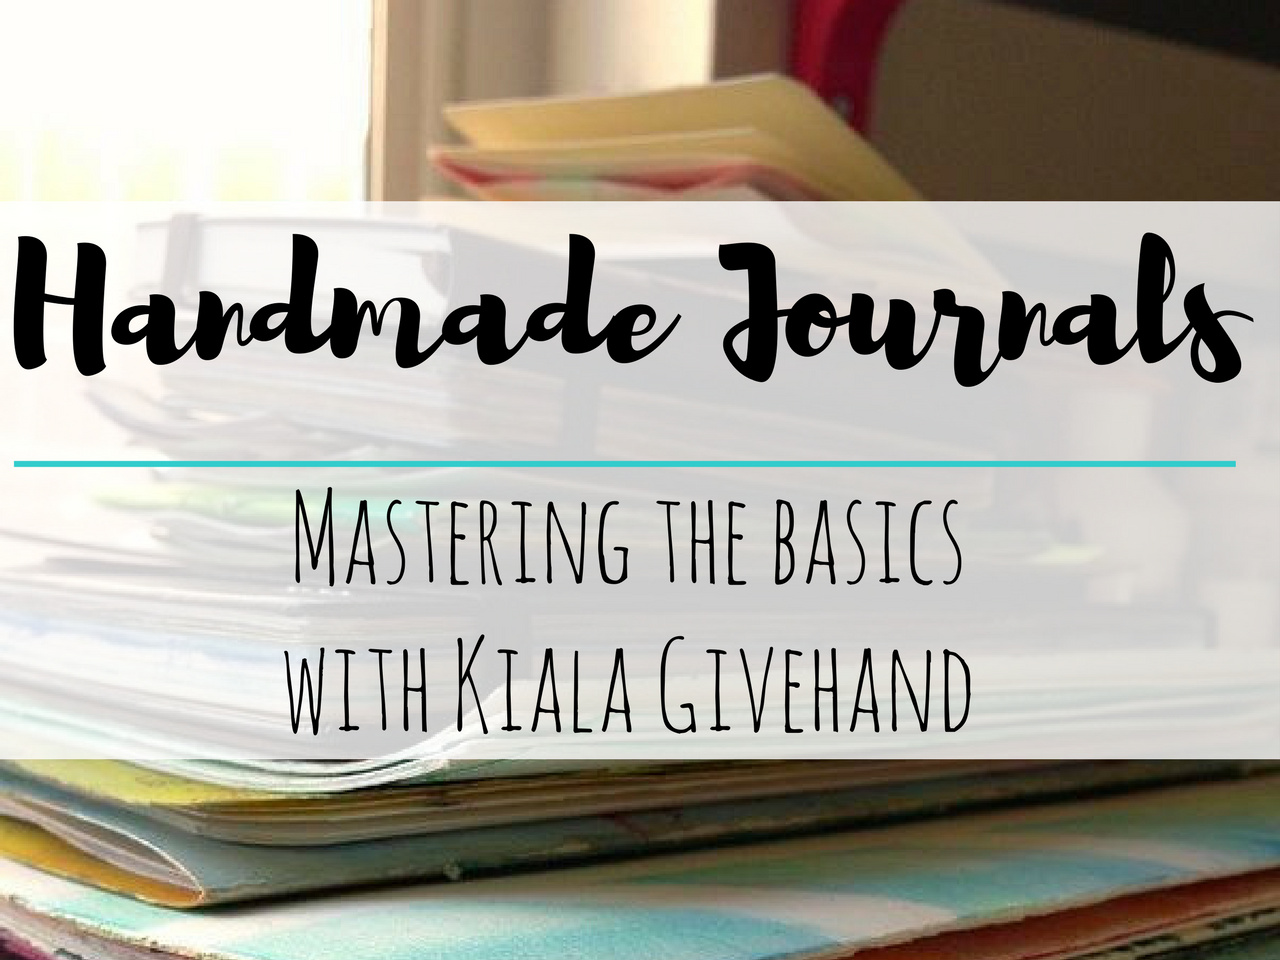 Beginner art journaling classes you can take online: Handmade Journals: Mastering The Basics #artjournaling #artjournalideas #artjournalclasses #bulletjournal